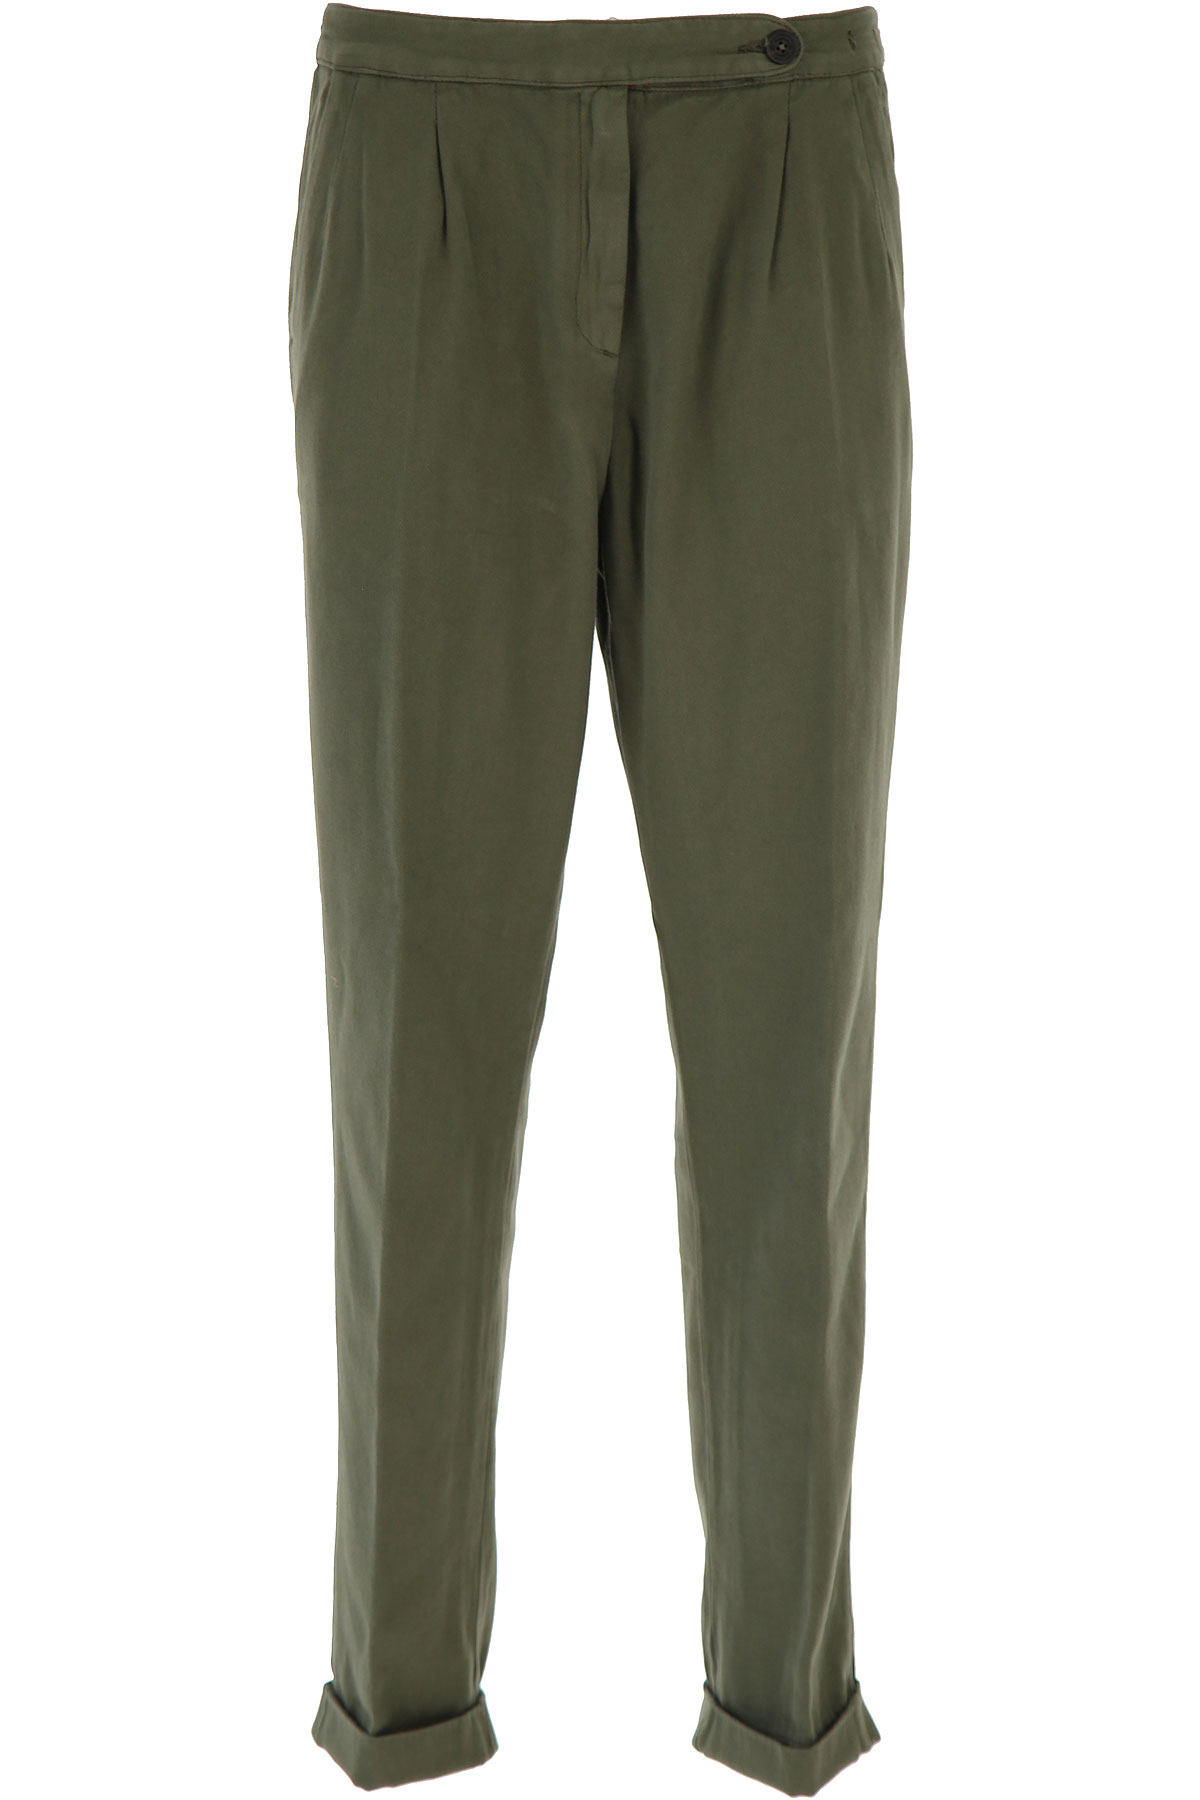 Massimo Alba Pants for Women On Sale, Military Green, Cotton, 2019, 26 28 32